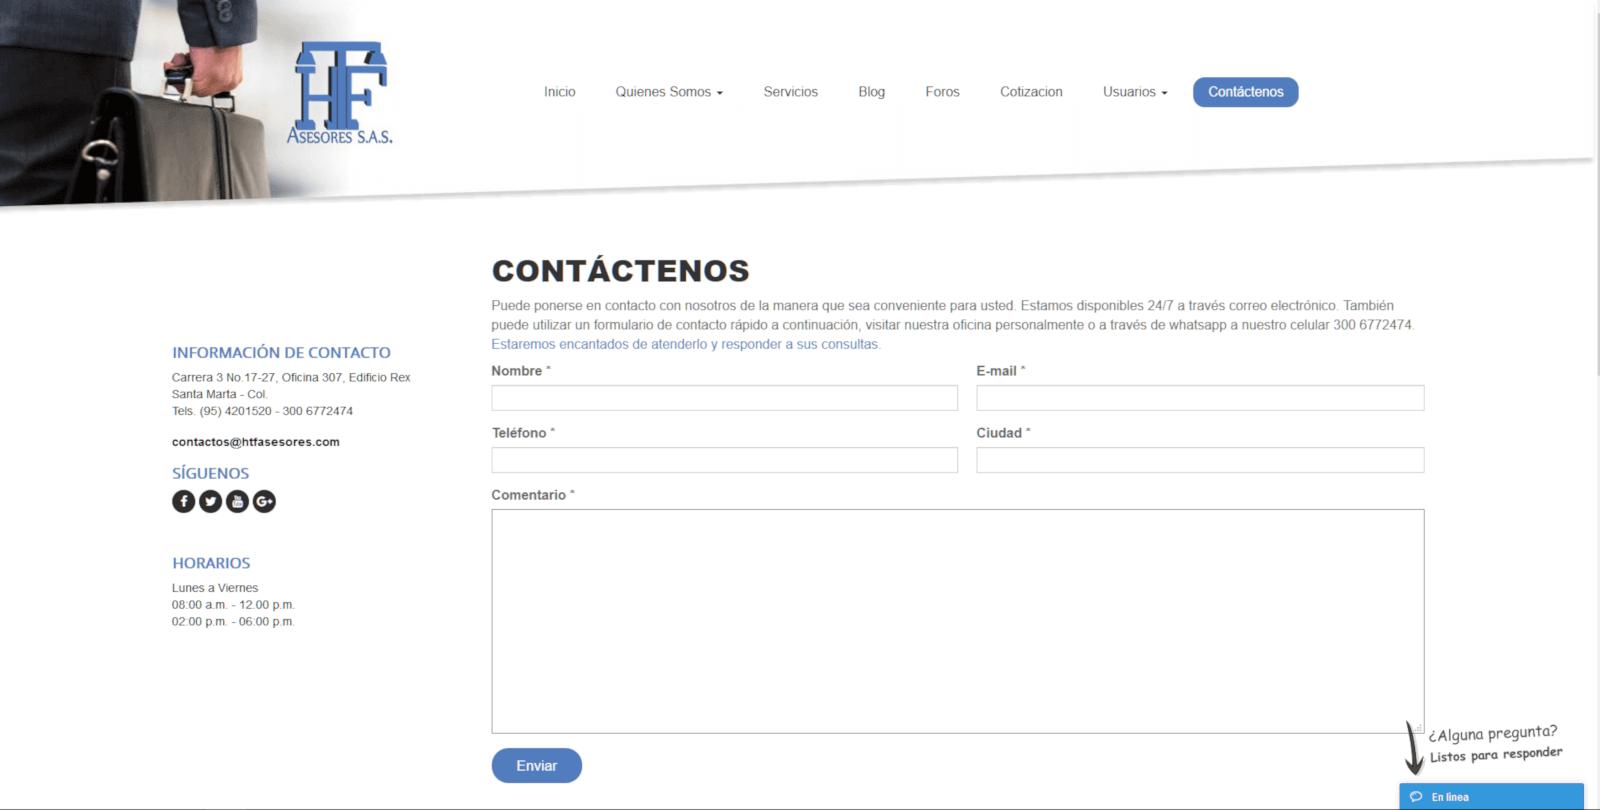 CONTACTO HTFASESORES DISENO WEB COLOMBIA